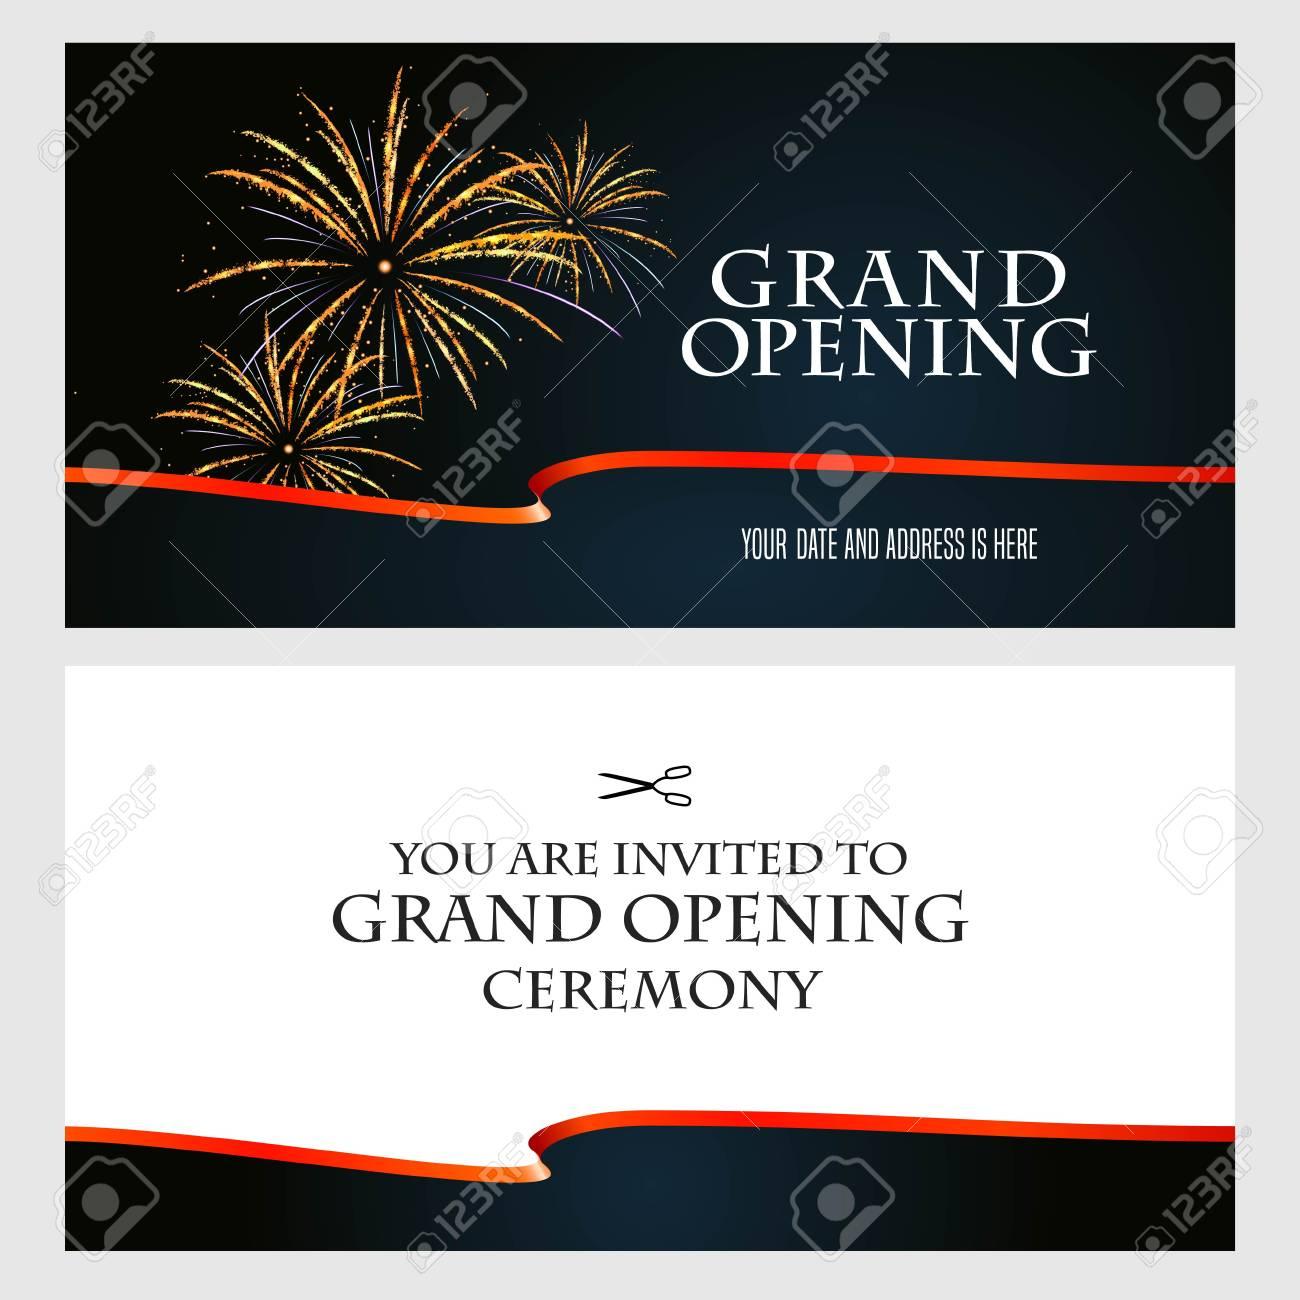 Grand Opening Vector Illustration Background Invitation Card